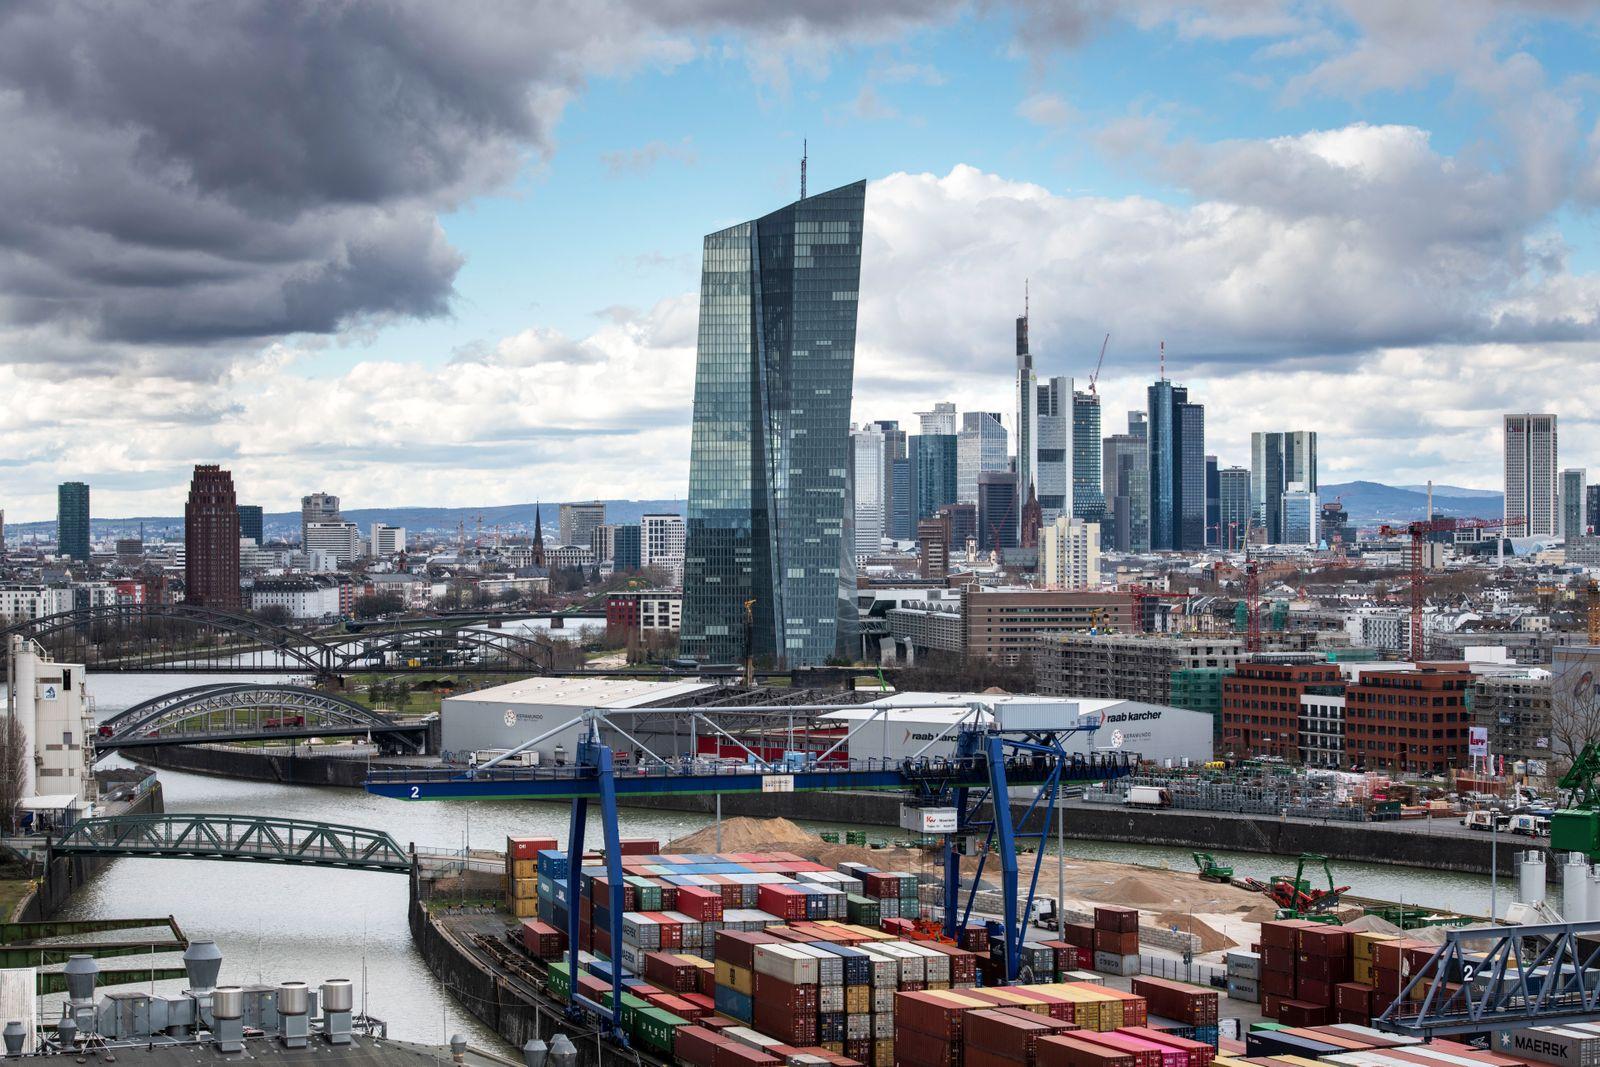 EZB / Frankfurt / Skyline / Banken / Banken-Viertel / Konjunktur